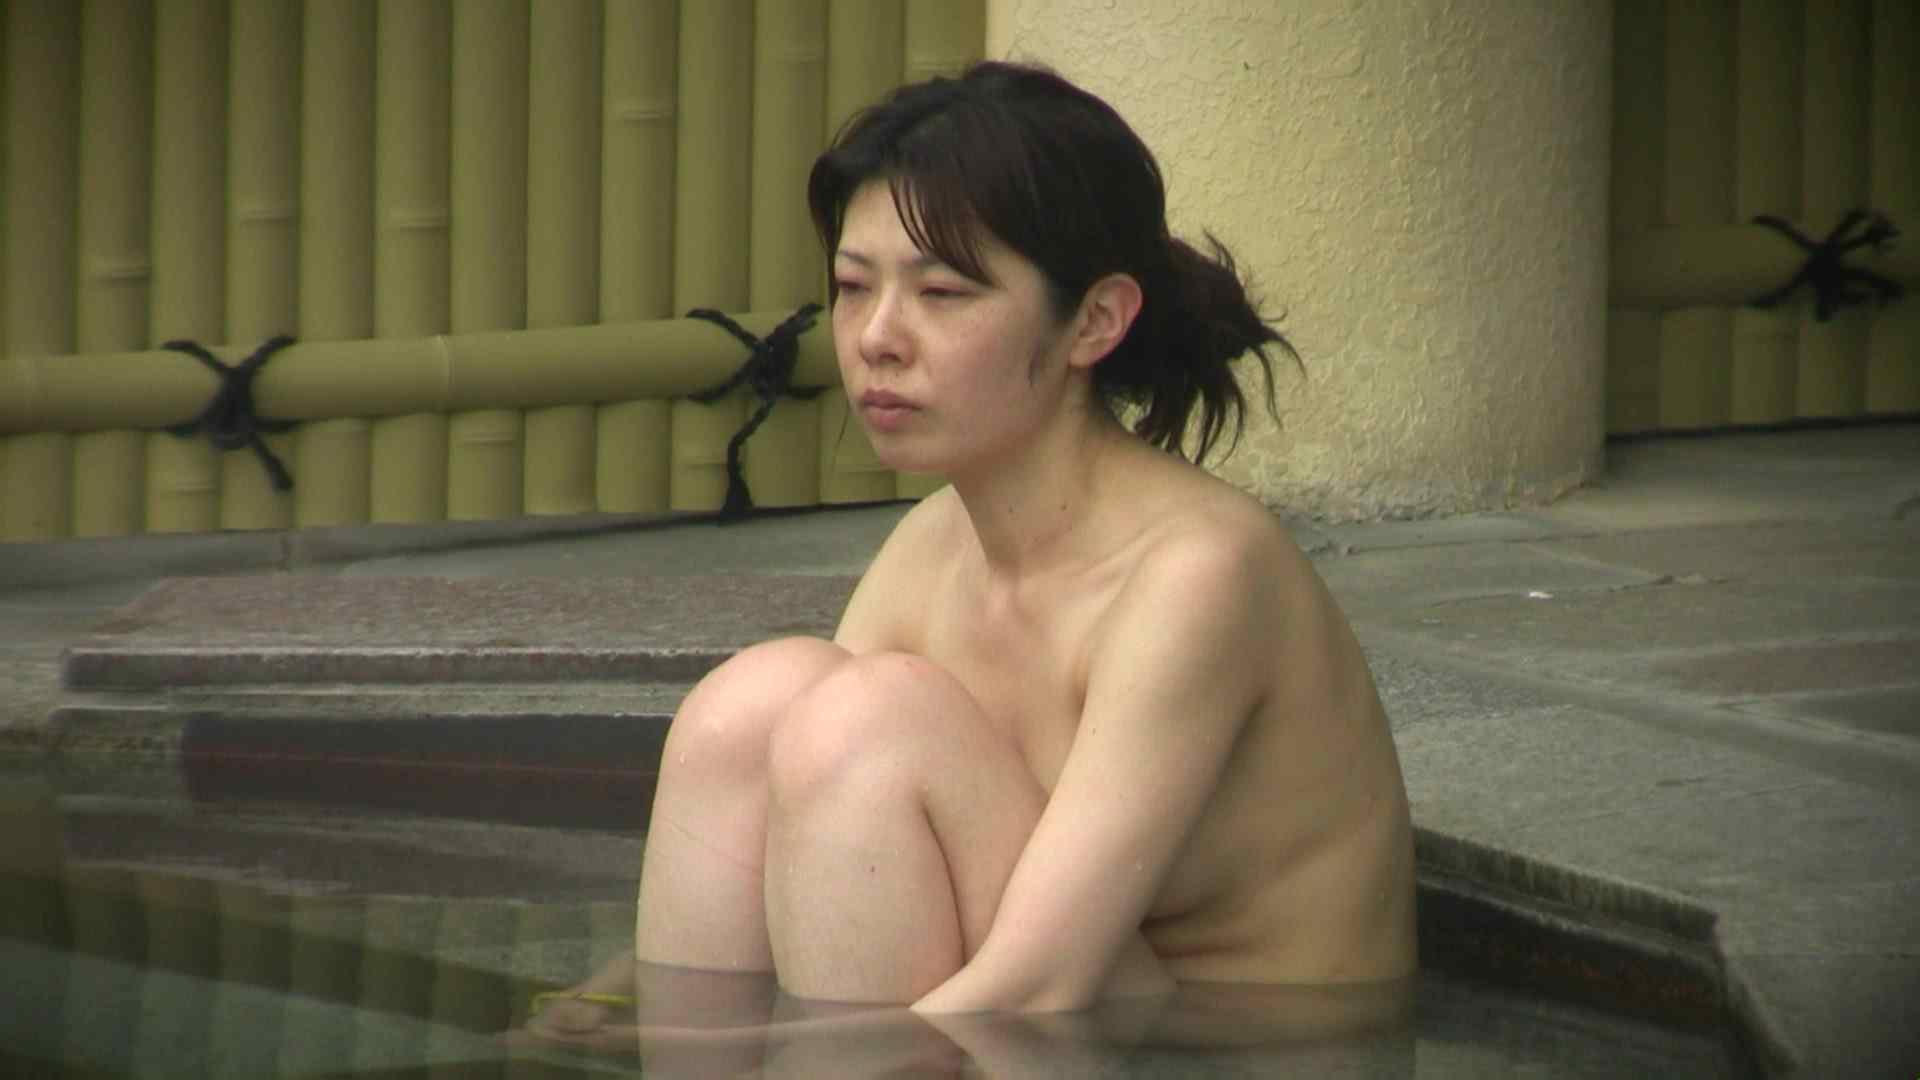 Aquaな露天風呂Vol.676 盗撮シリーズ | 露天風呂編  83PIX 61